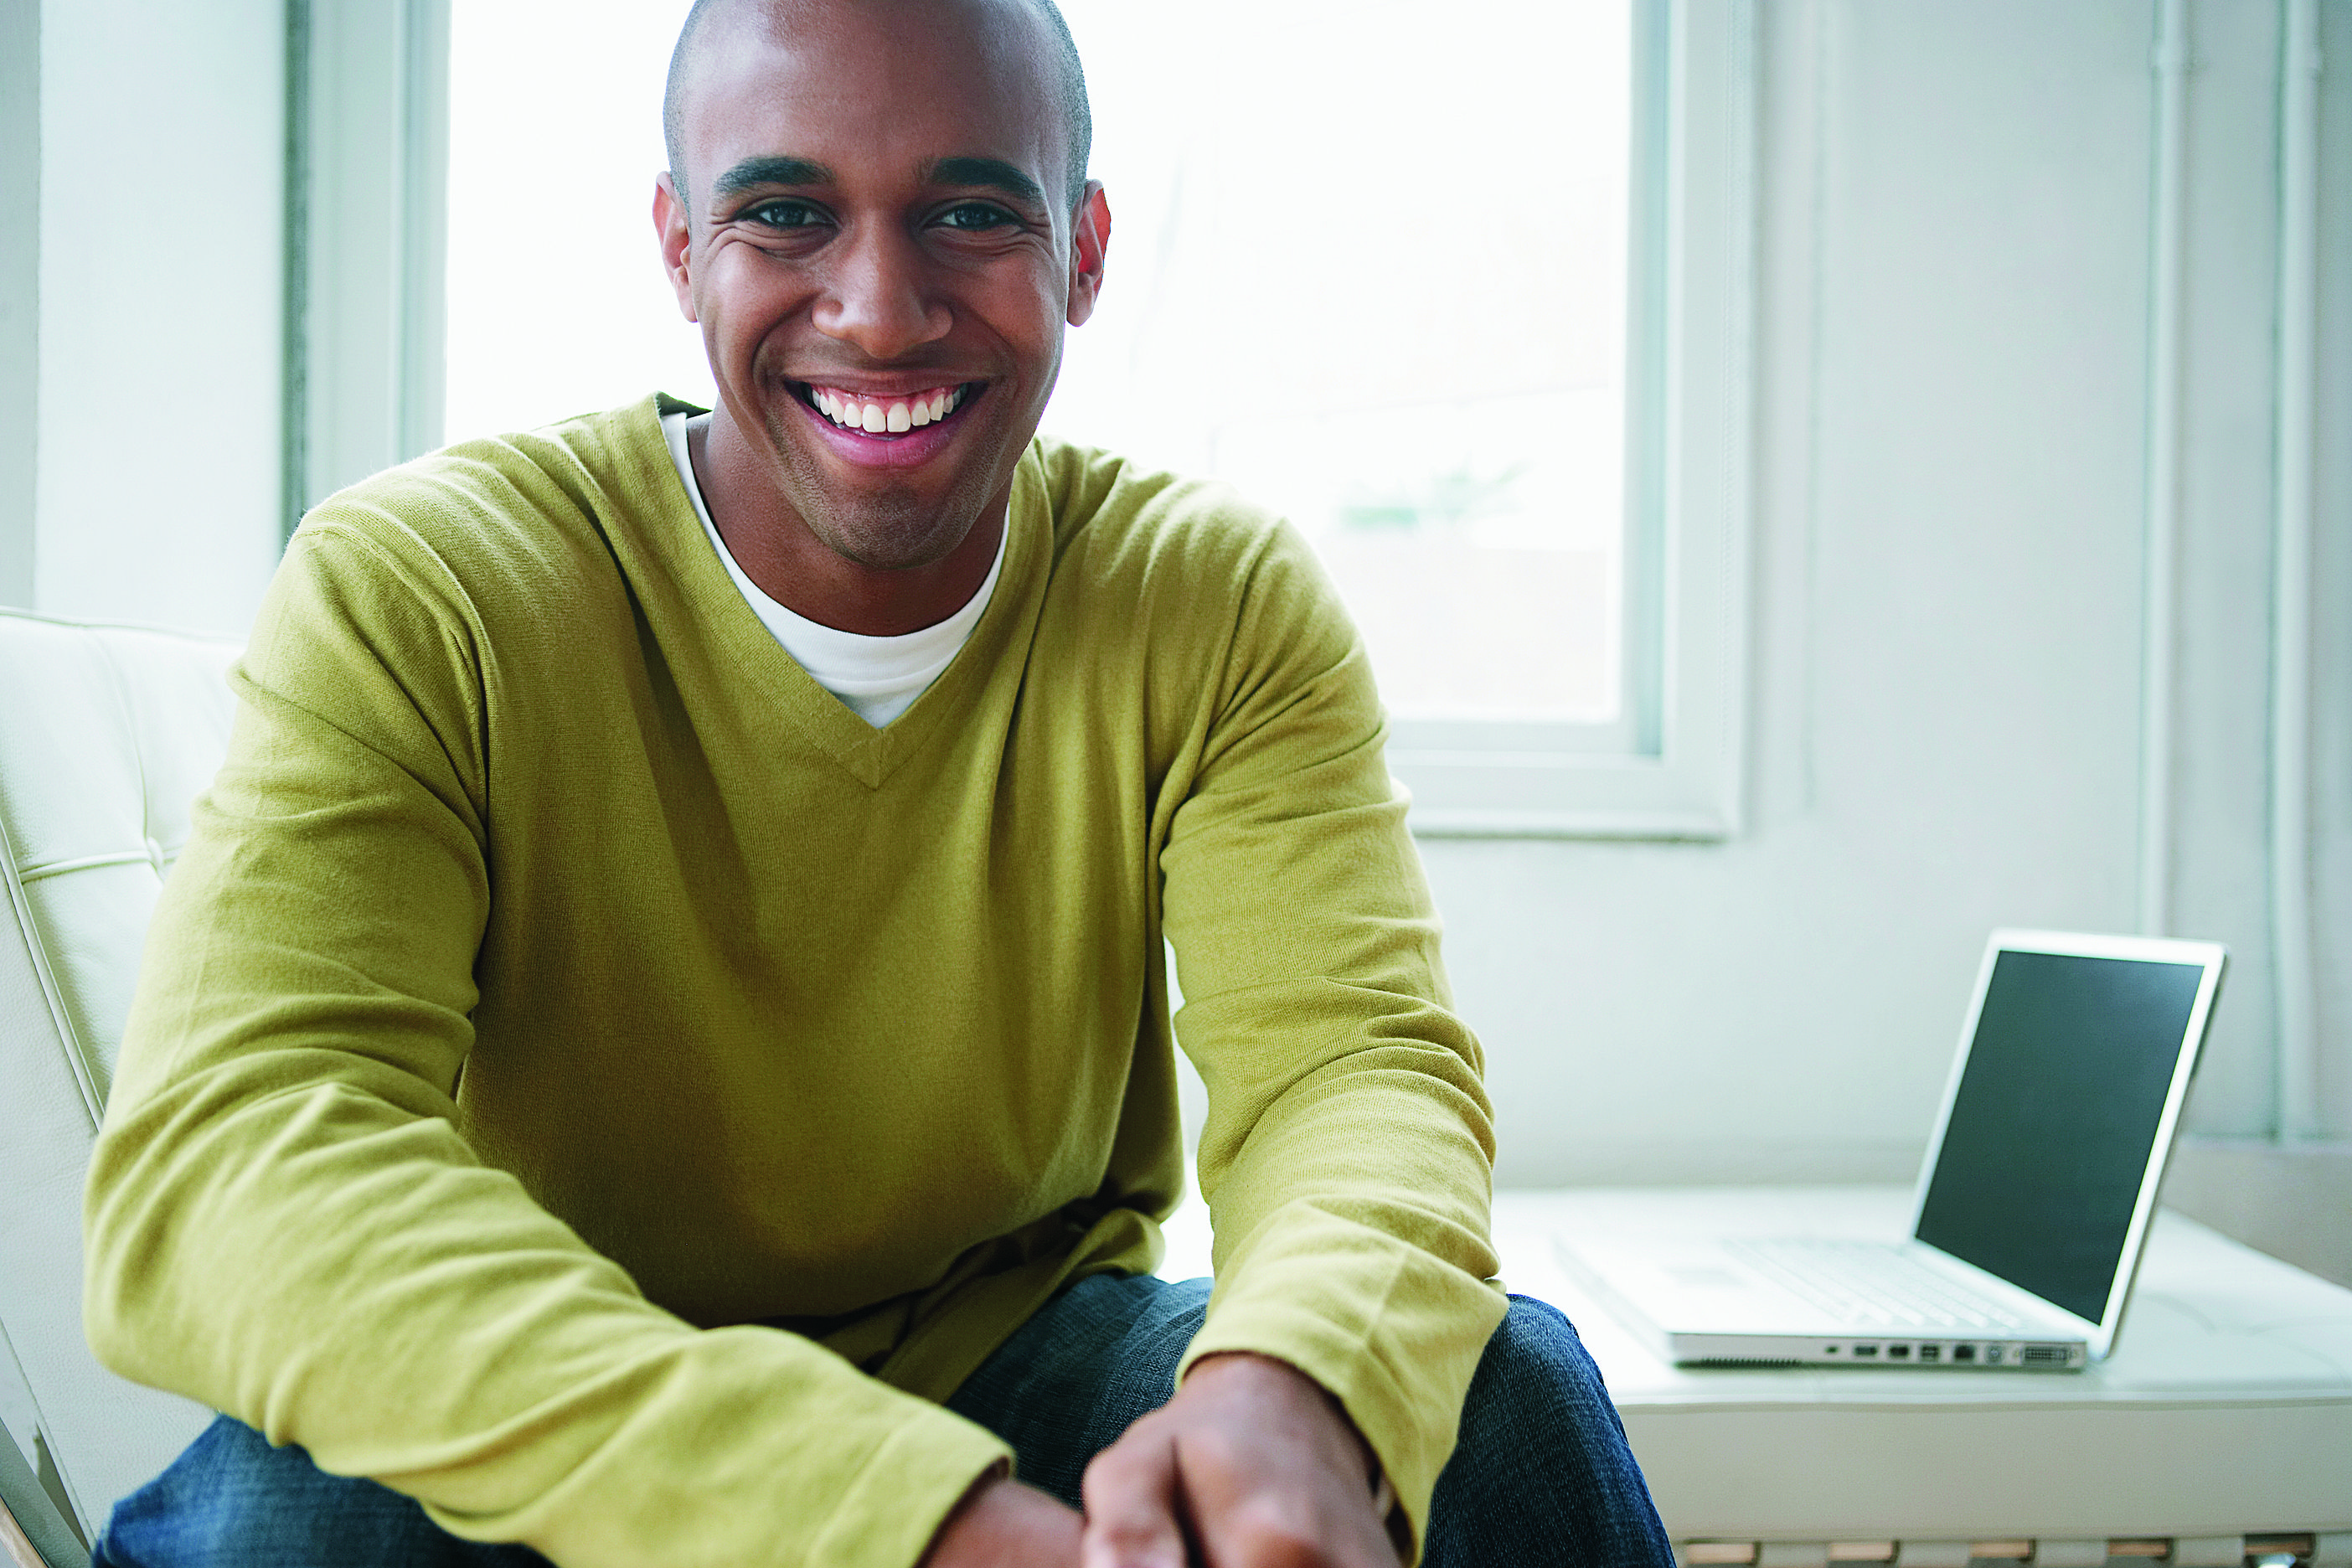 Dental Benefits Explained Dental insurance plans, Dental